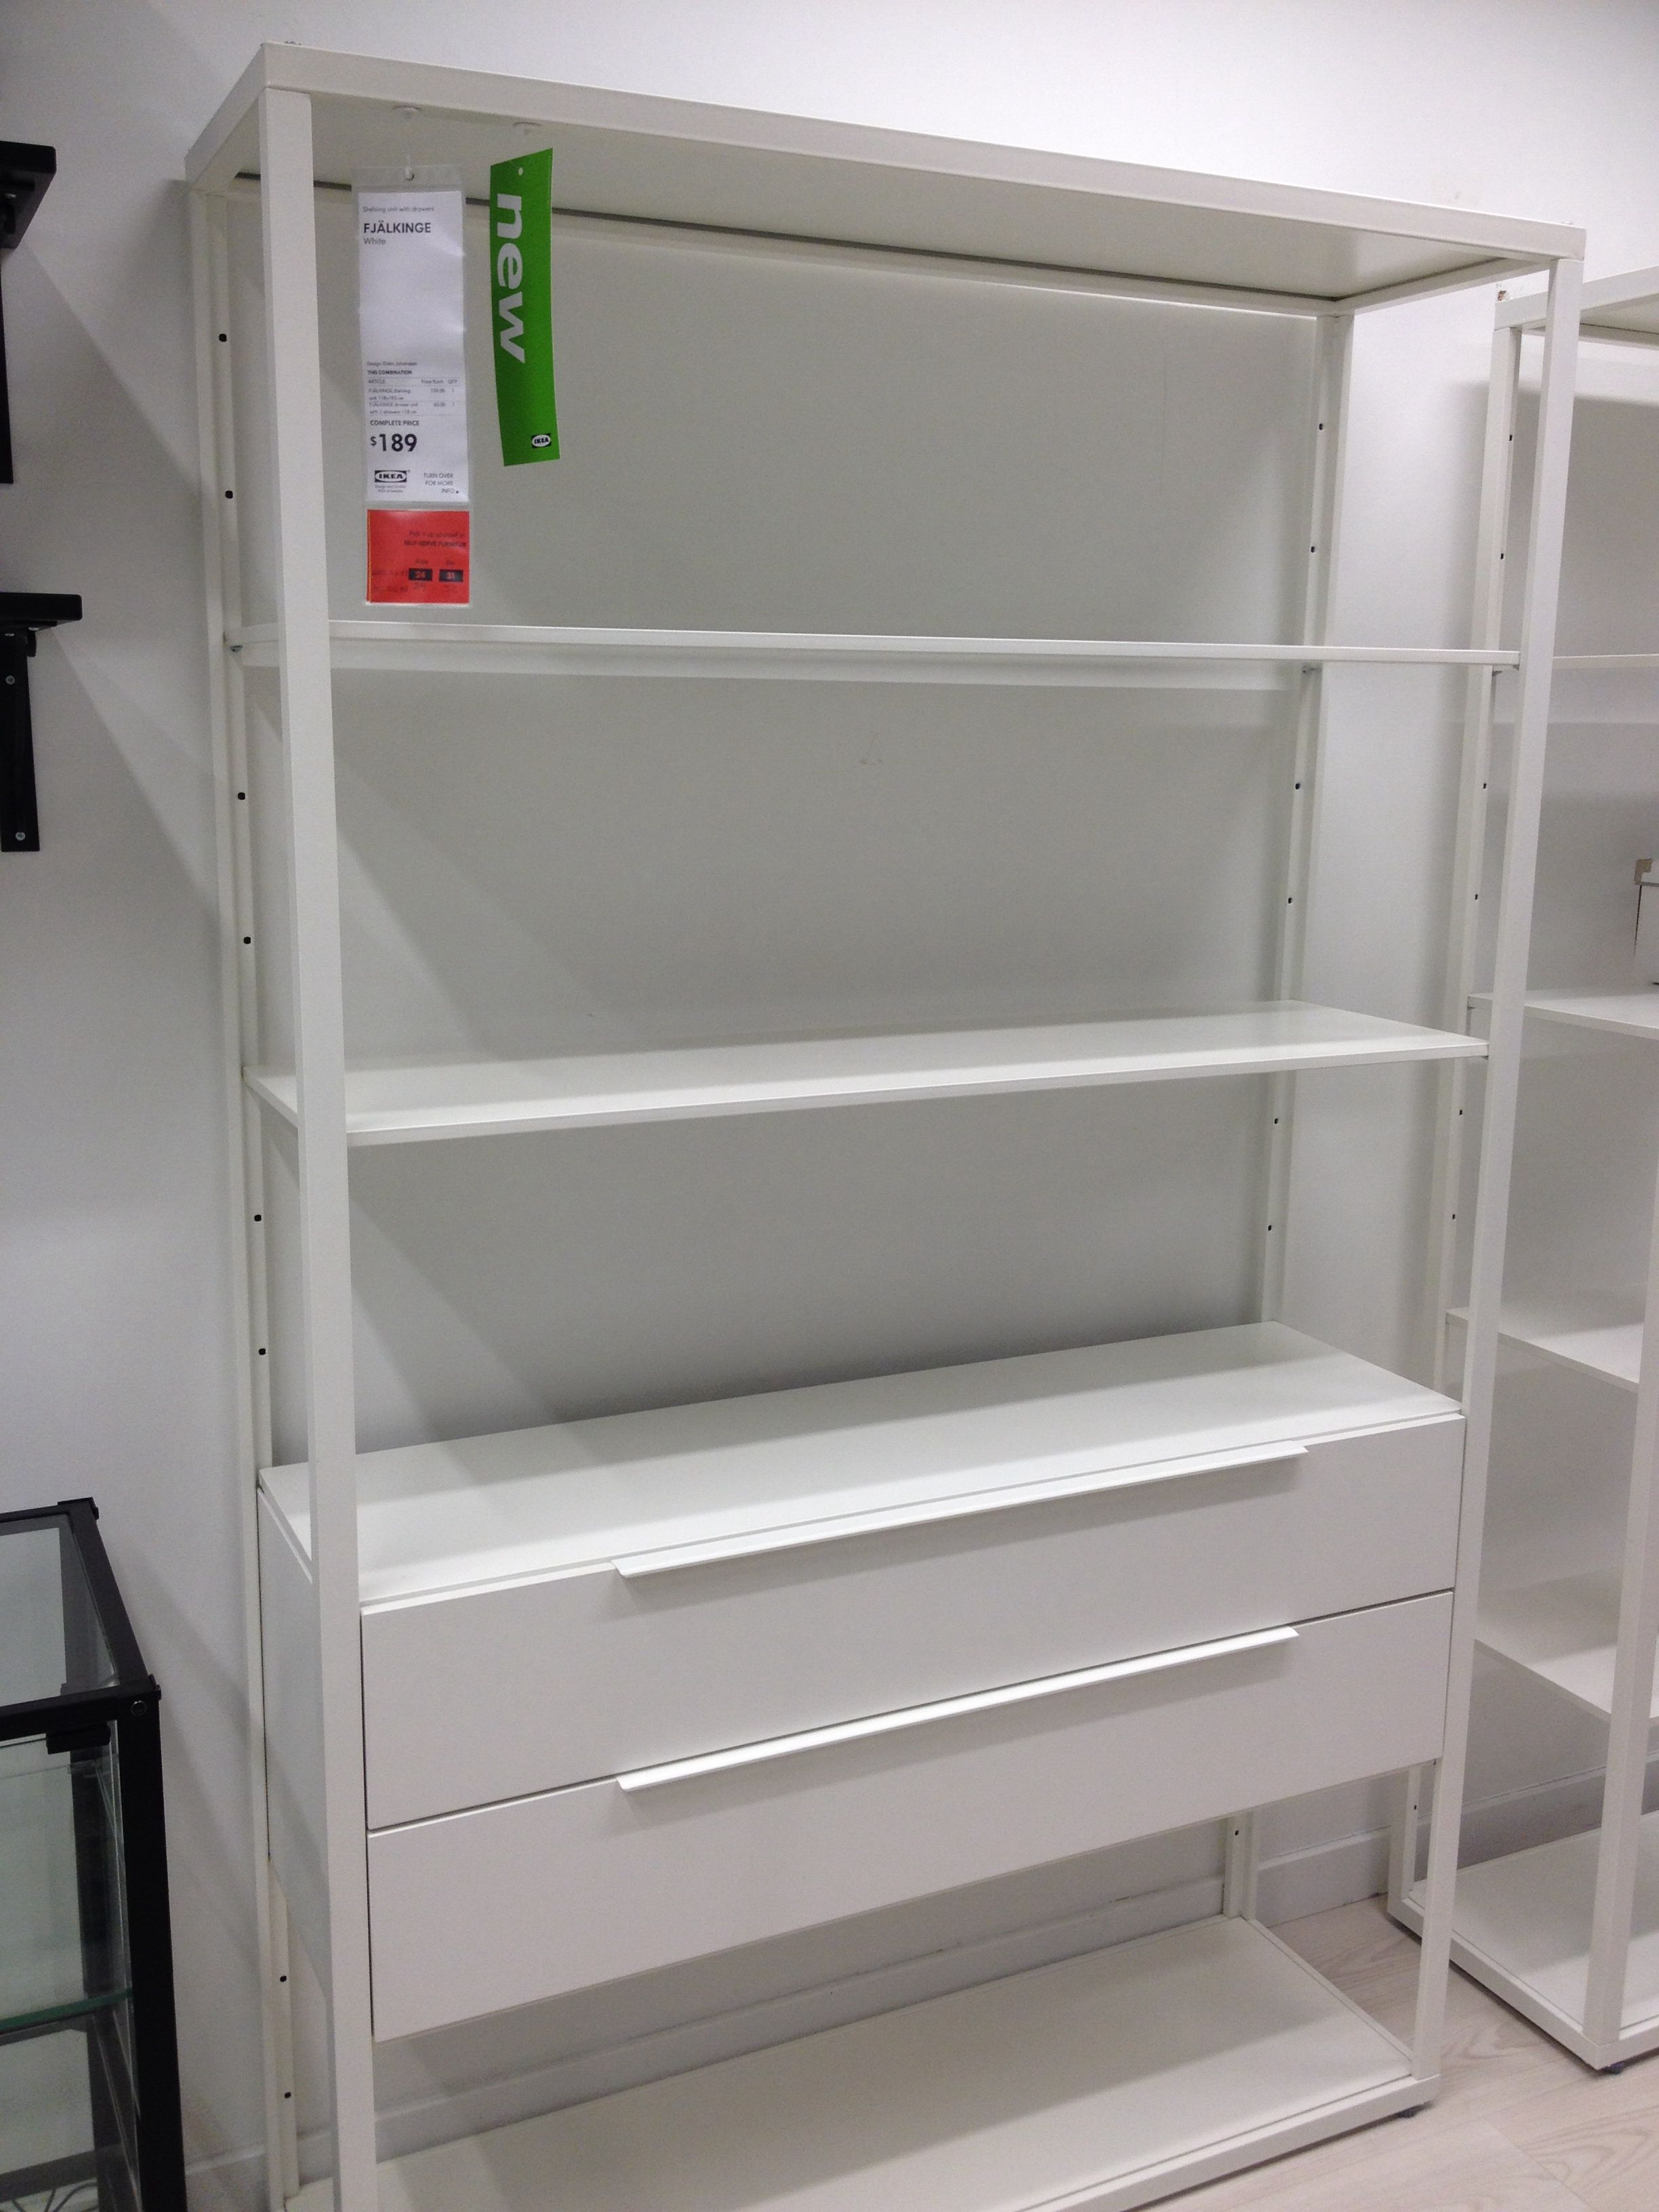 Pantry? Ikea